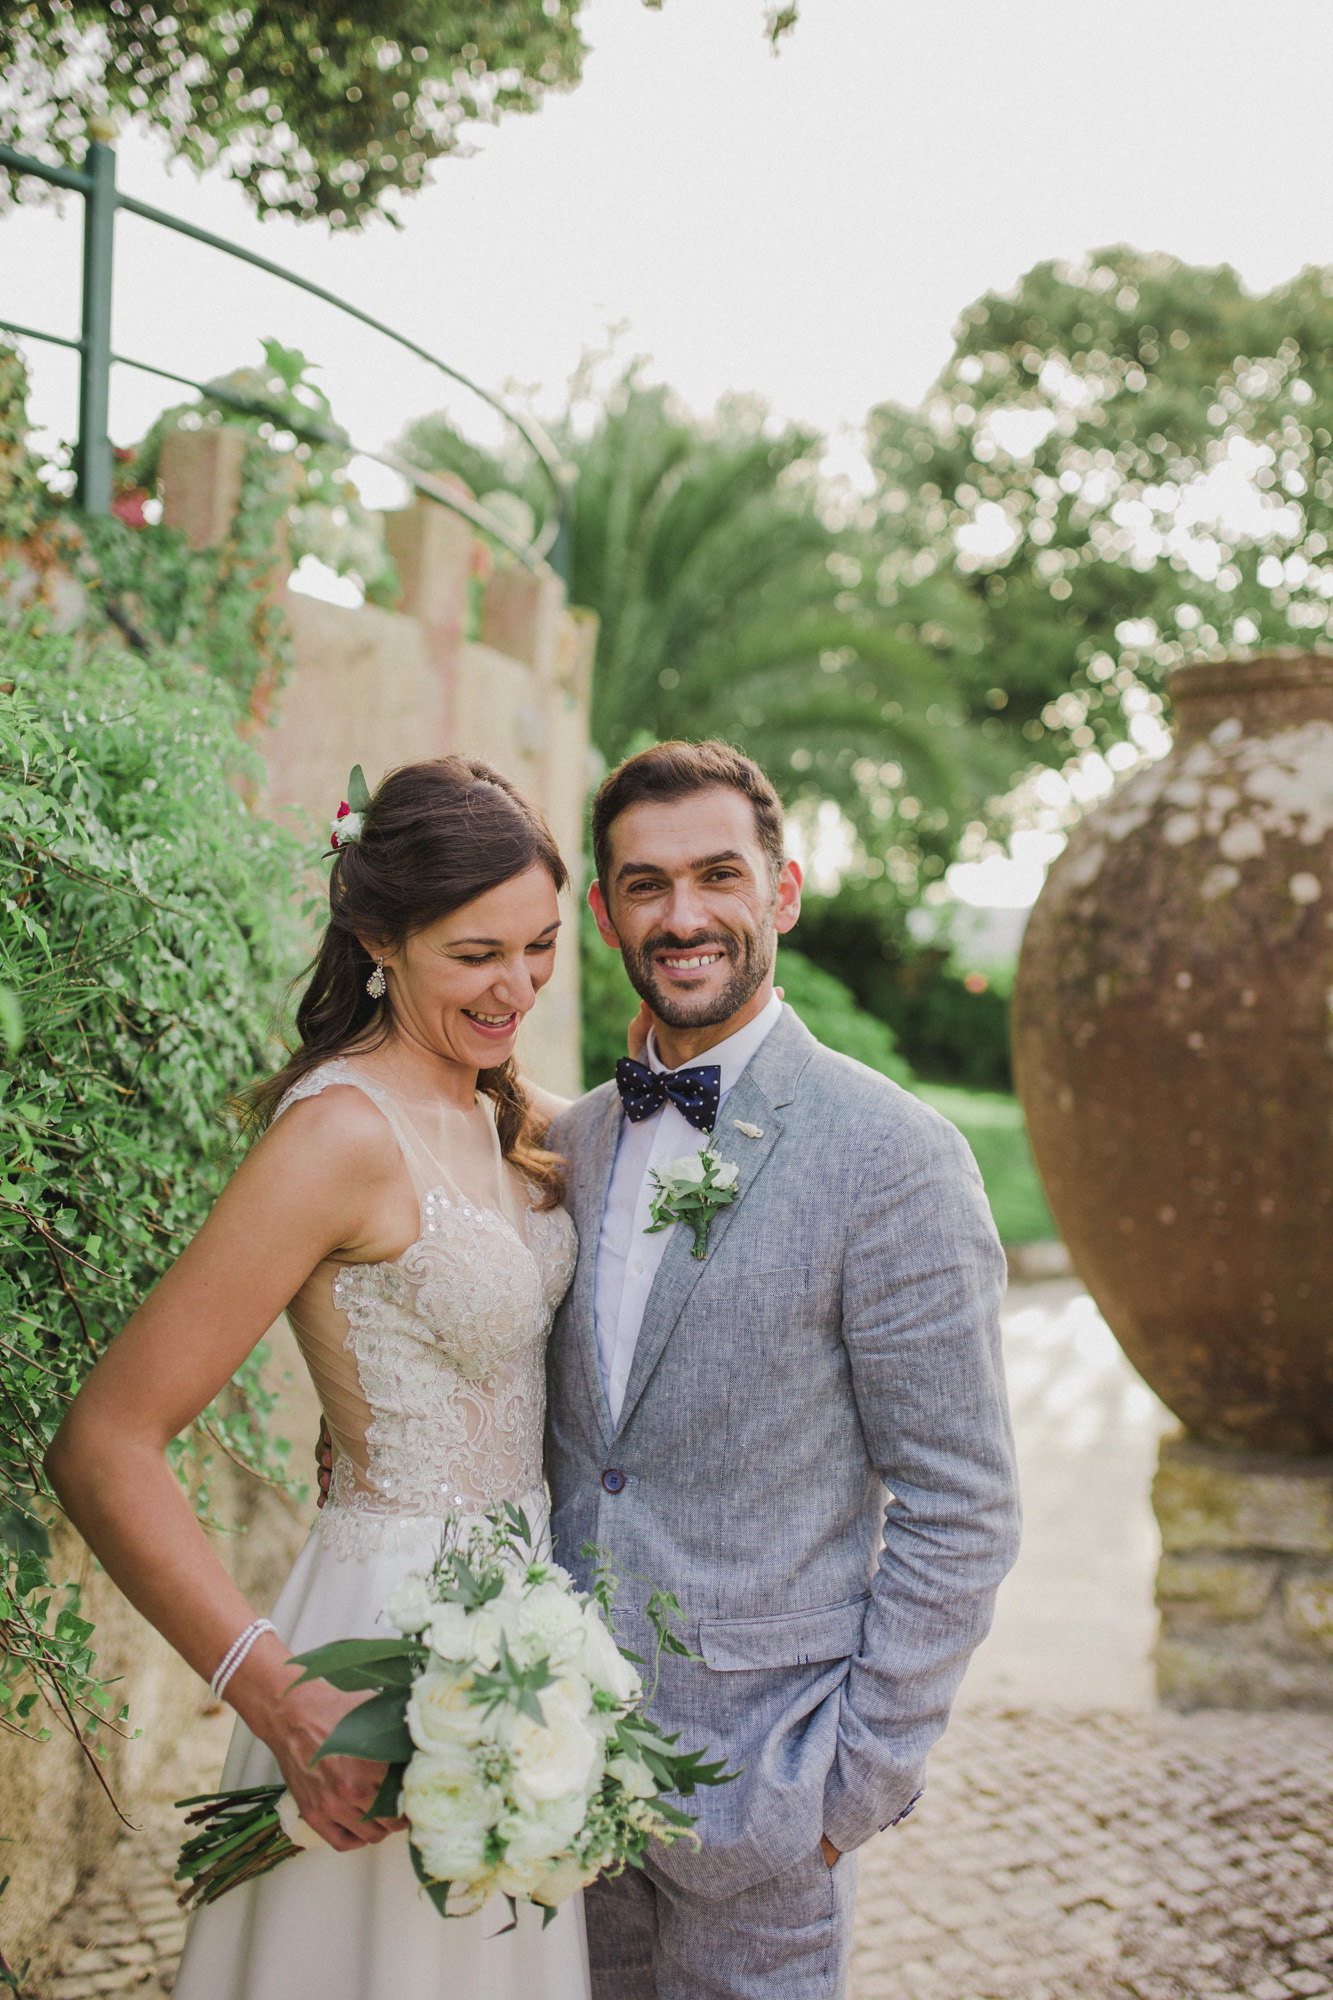 035-carina-e-samuel-wedding-casamento-quinta-dos-rouxinois-rustico-my-fancy-wedding-mafra-malveira-lisboa-sintra-cascais-filipe-santiago-fotografia-fotografo-lifestyle-destination-portugal